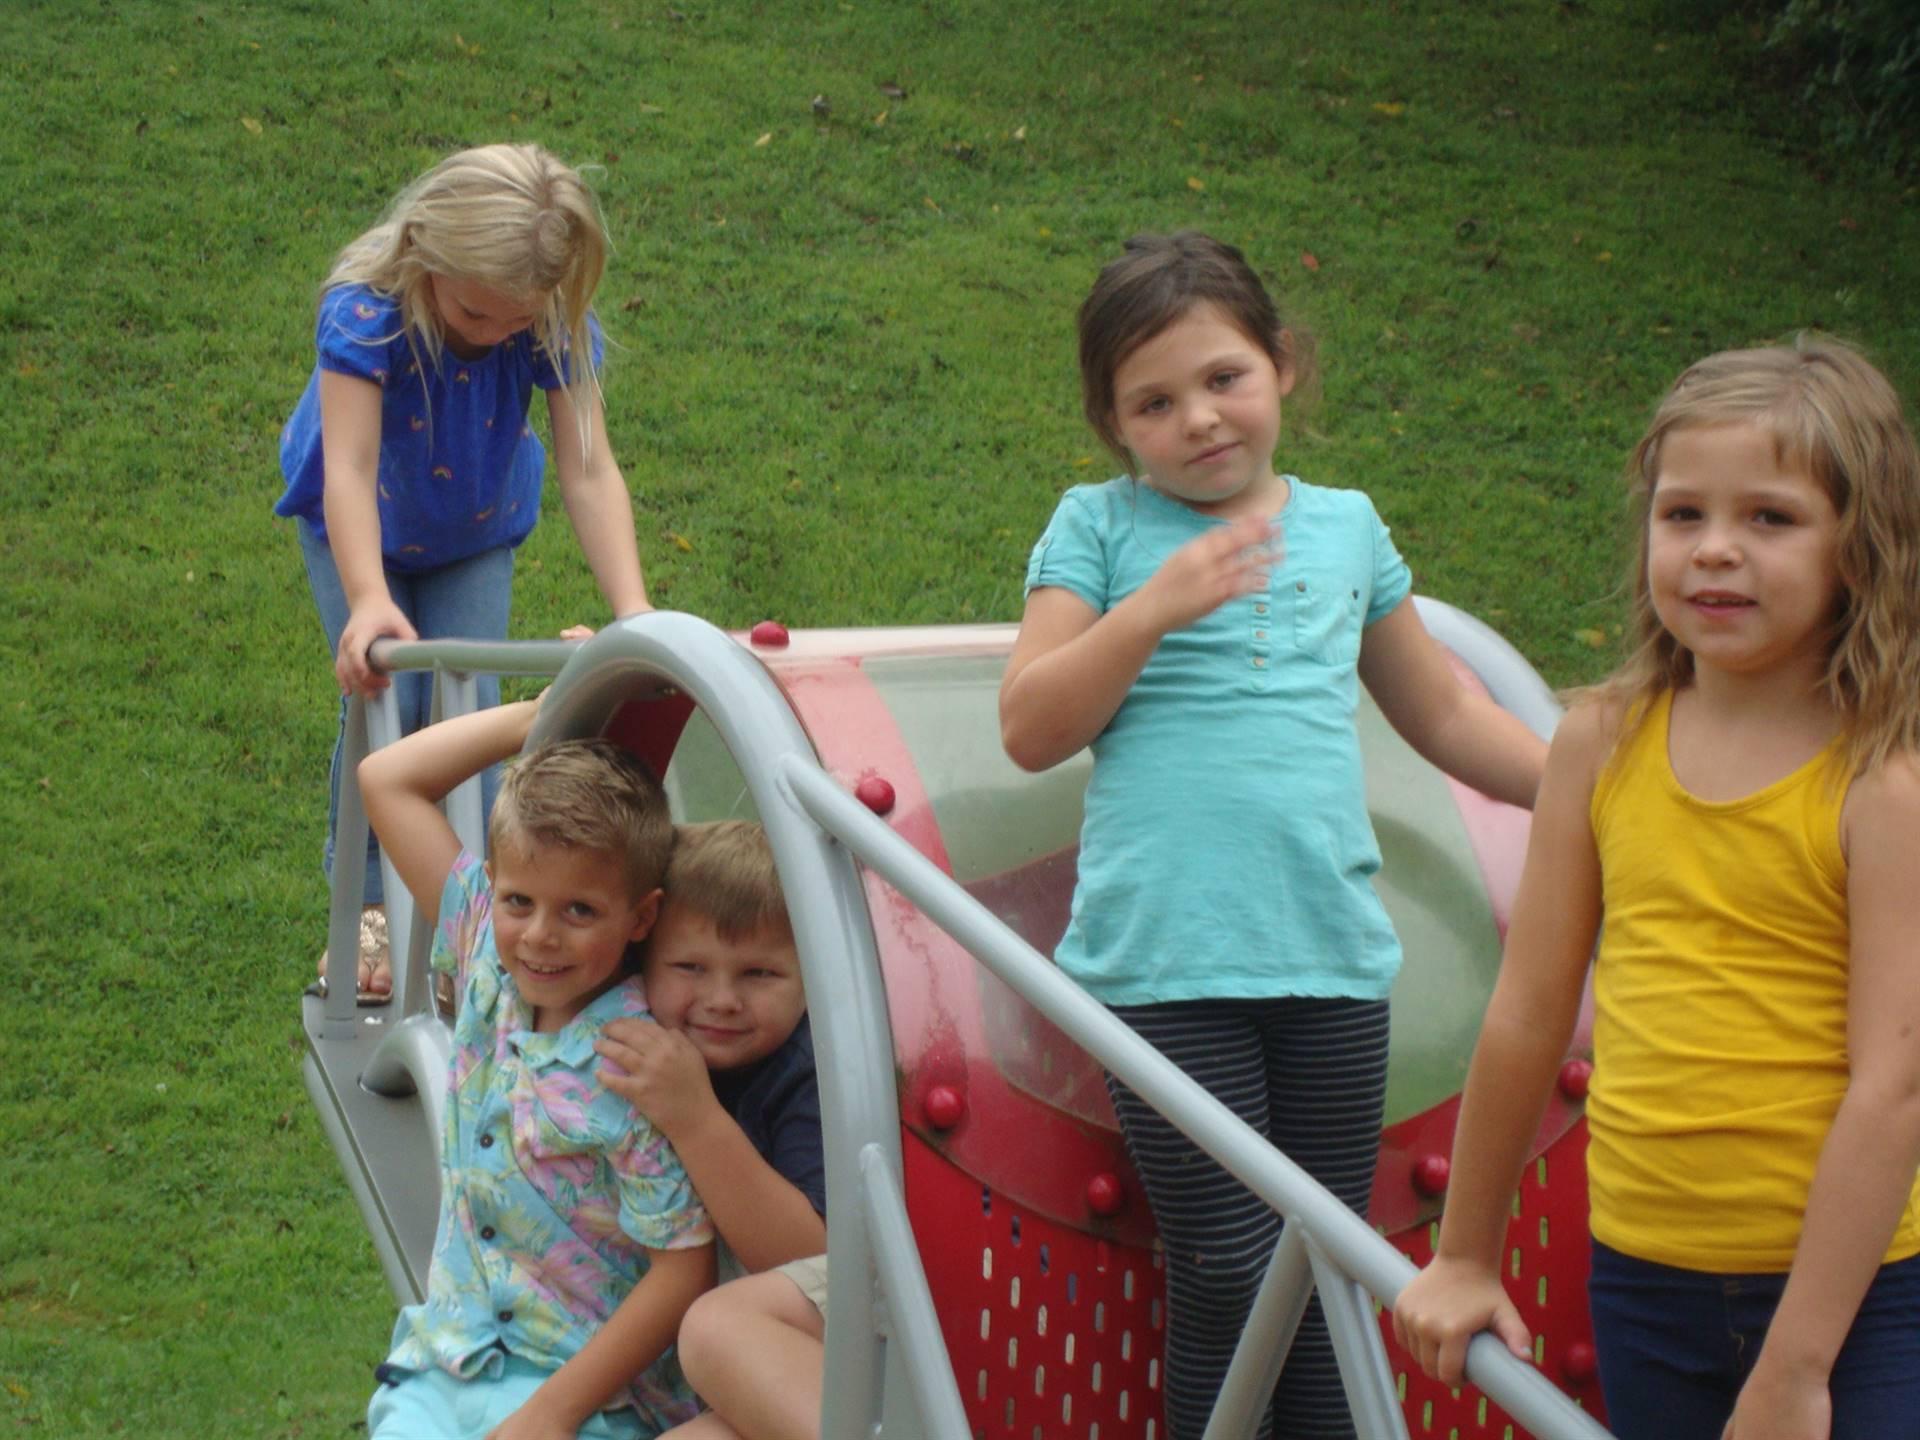 4 girls on teeter totter